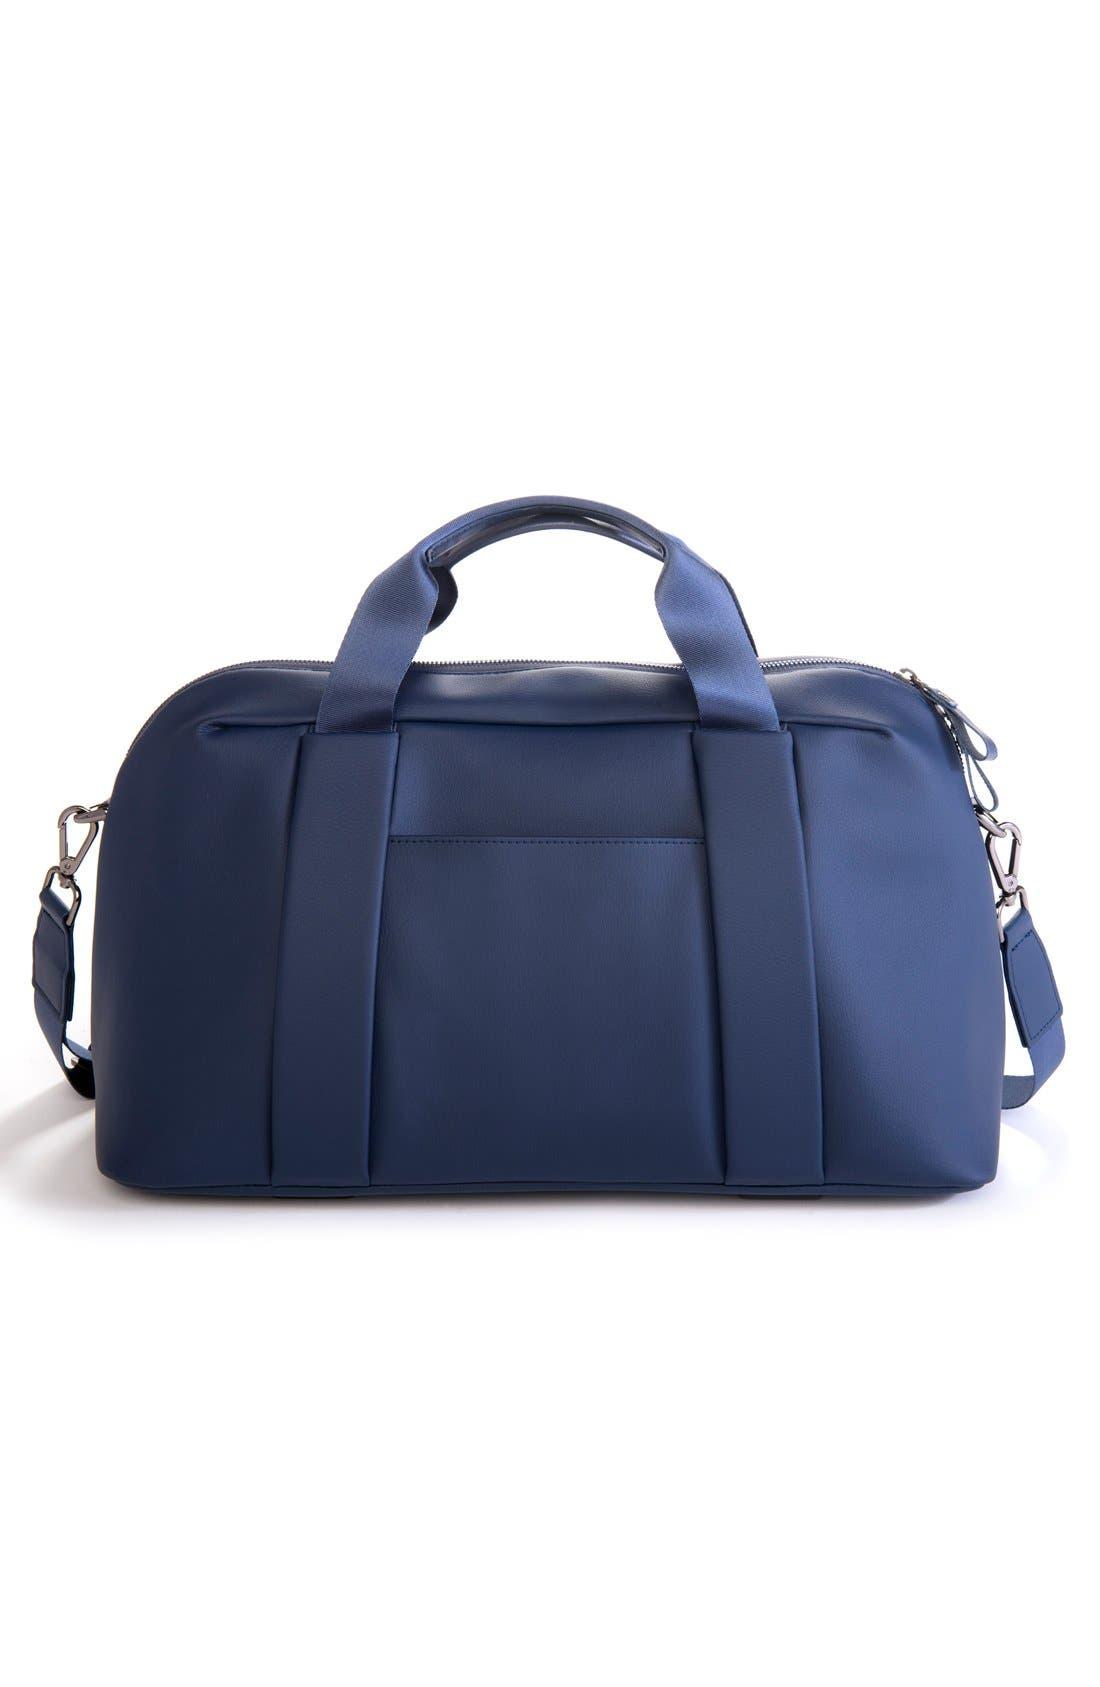 VESSEL,                             'Signature' Medium Duffel Bag,                             Alternate thumbnail 4, color,                             400